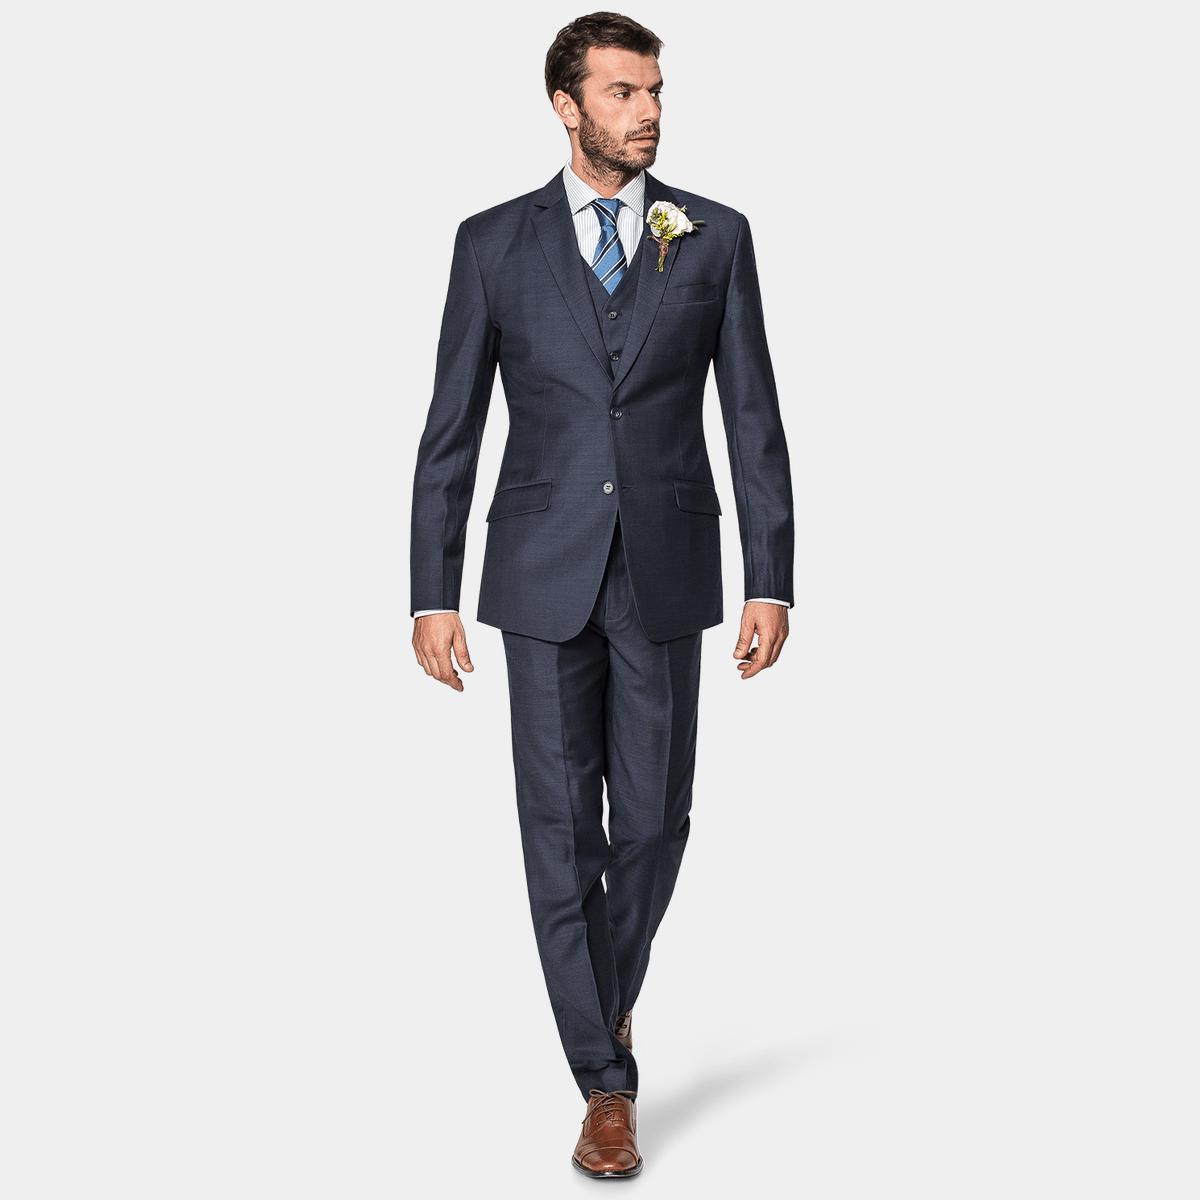 758217f5960c Men s Wedding Suits   Tuxedos